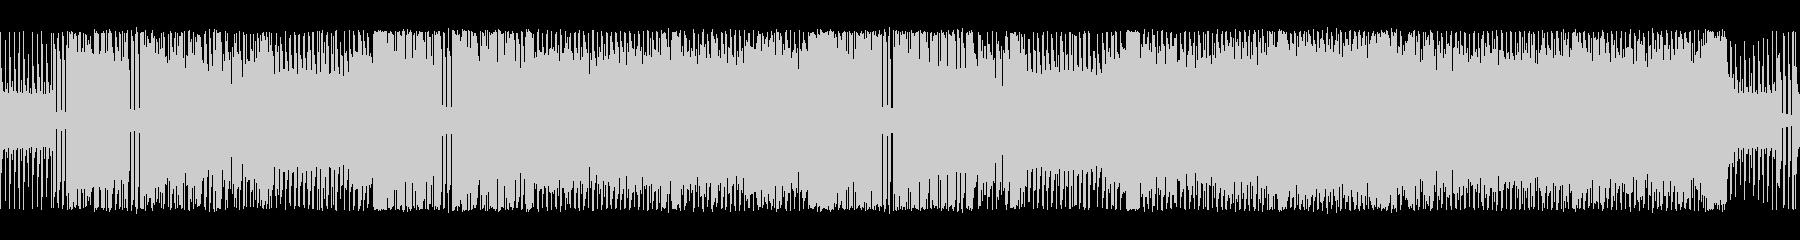 8-Bit_Action Aggressive4の未再生の波形